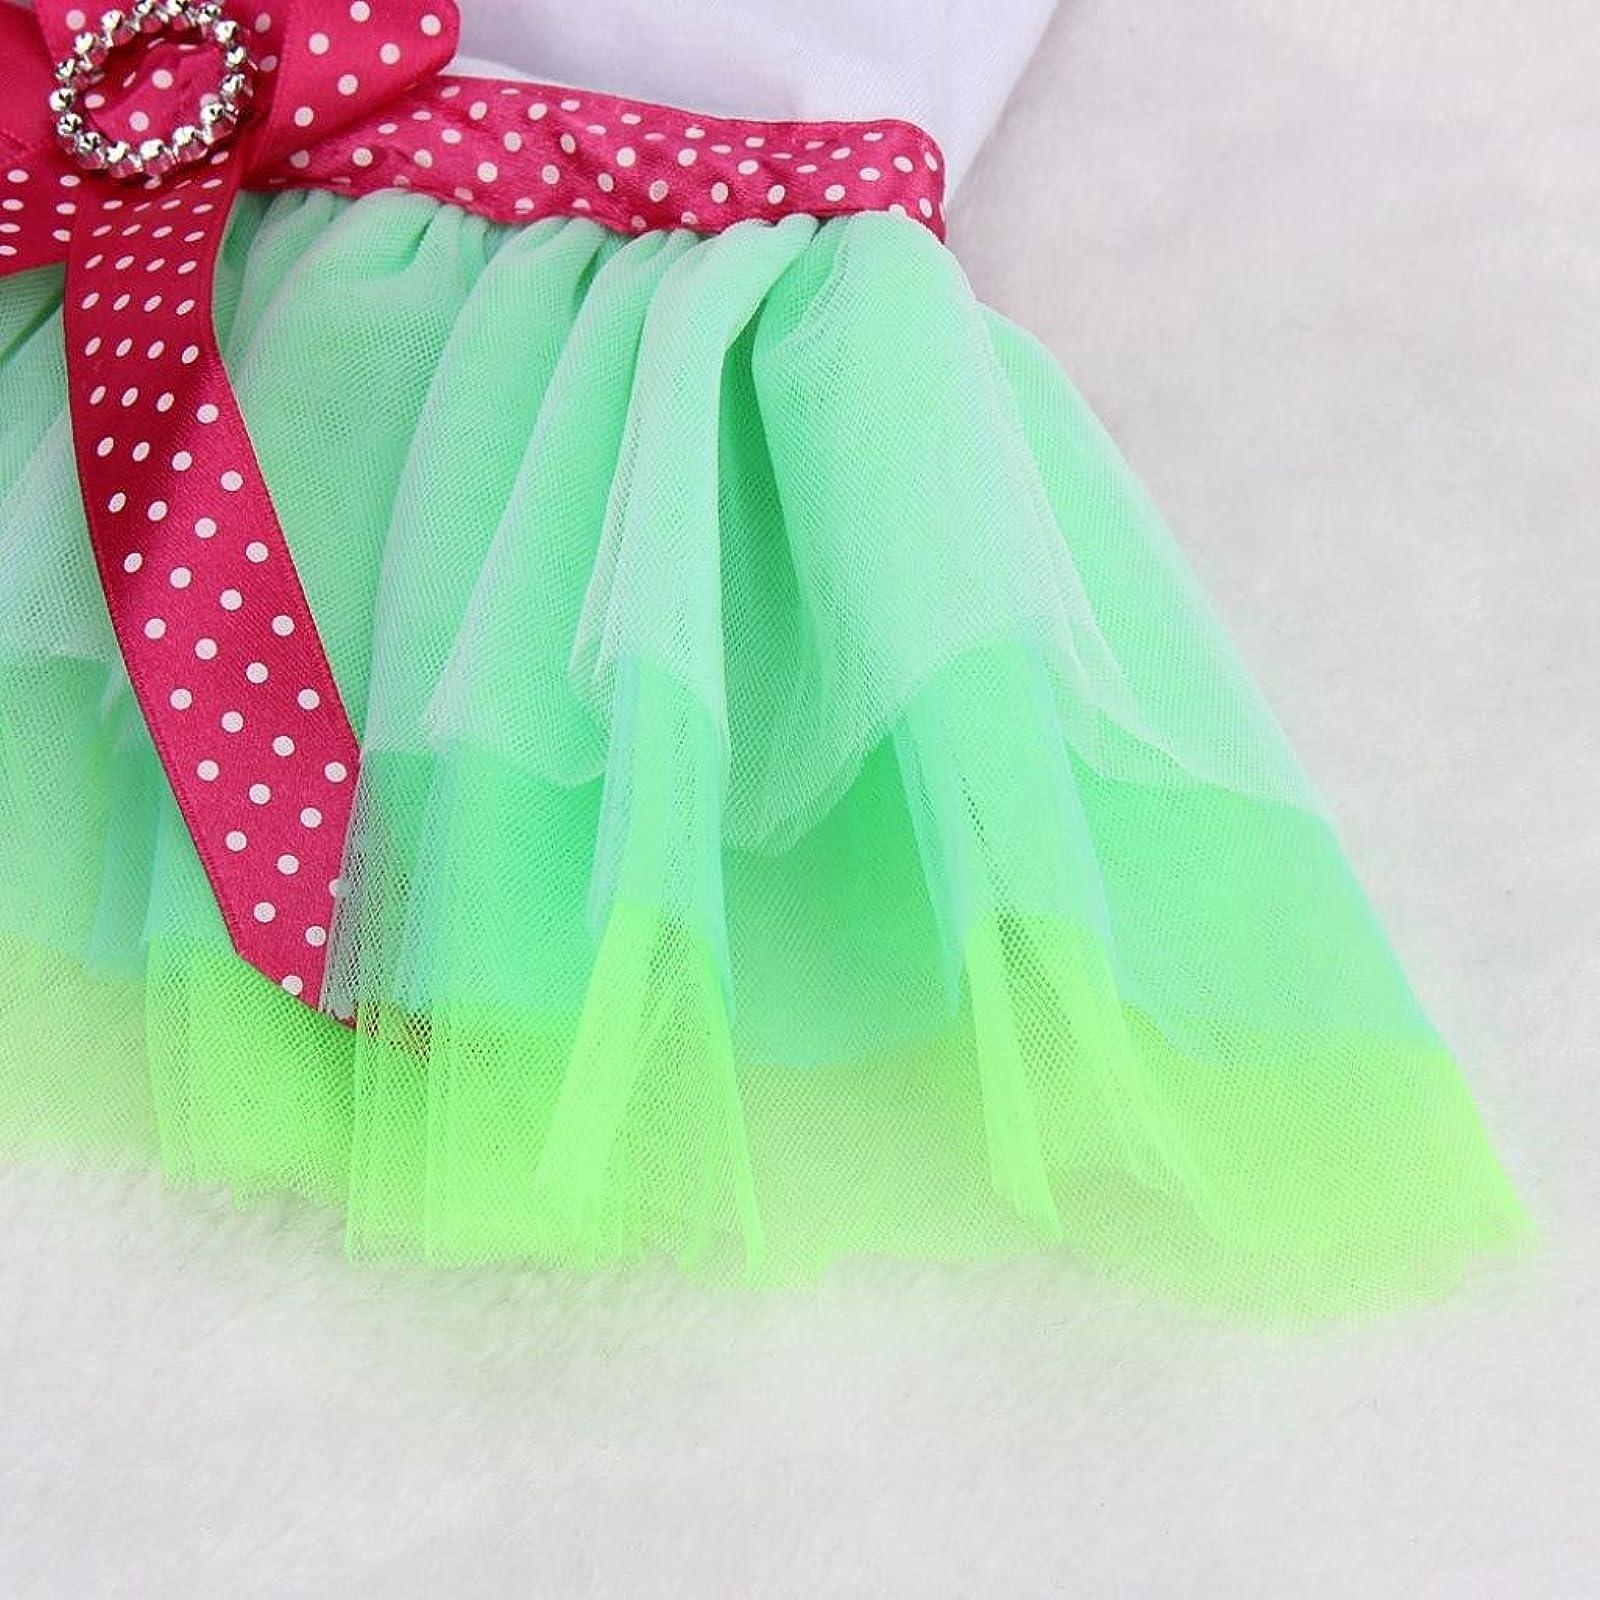 OutTop Girl Dog Dress Lace Princess Tutu WSM60224084S_YD - 4